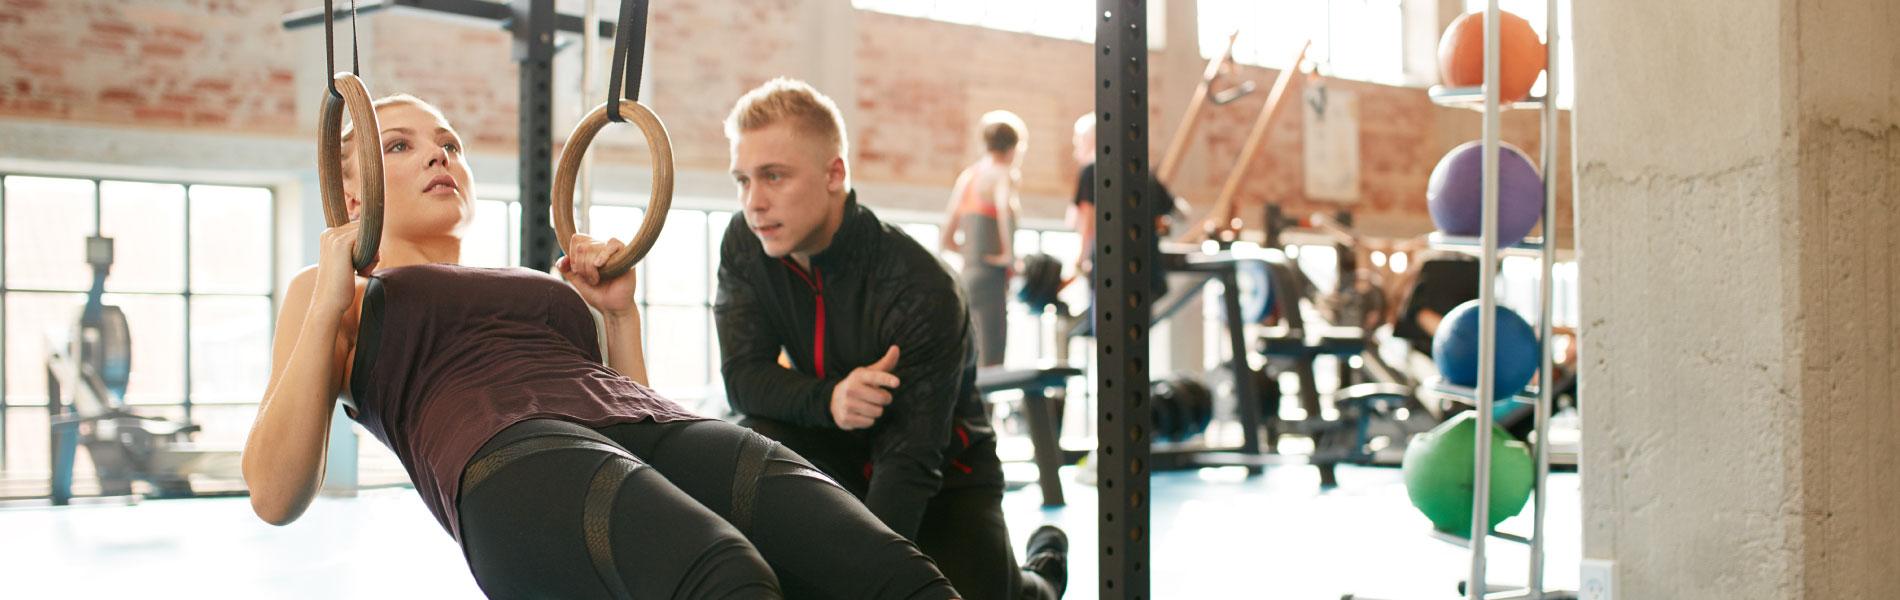 Selling_More_Fitness_Memberships_through_Motivation_1900x600.jpg